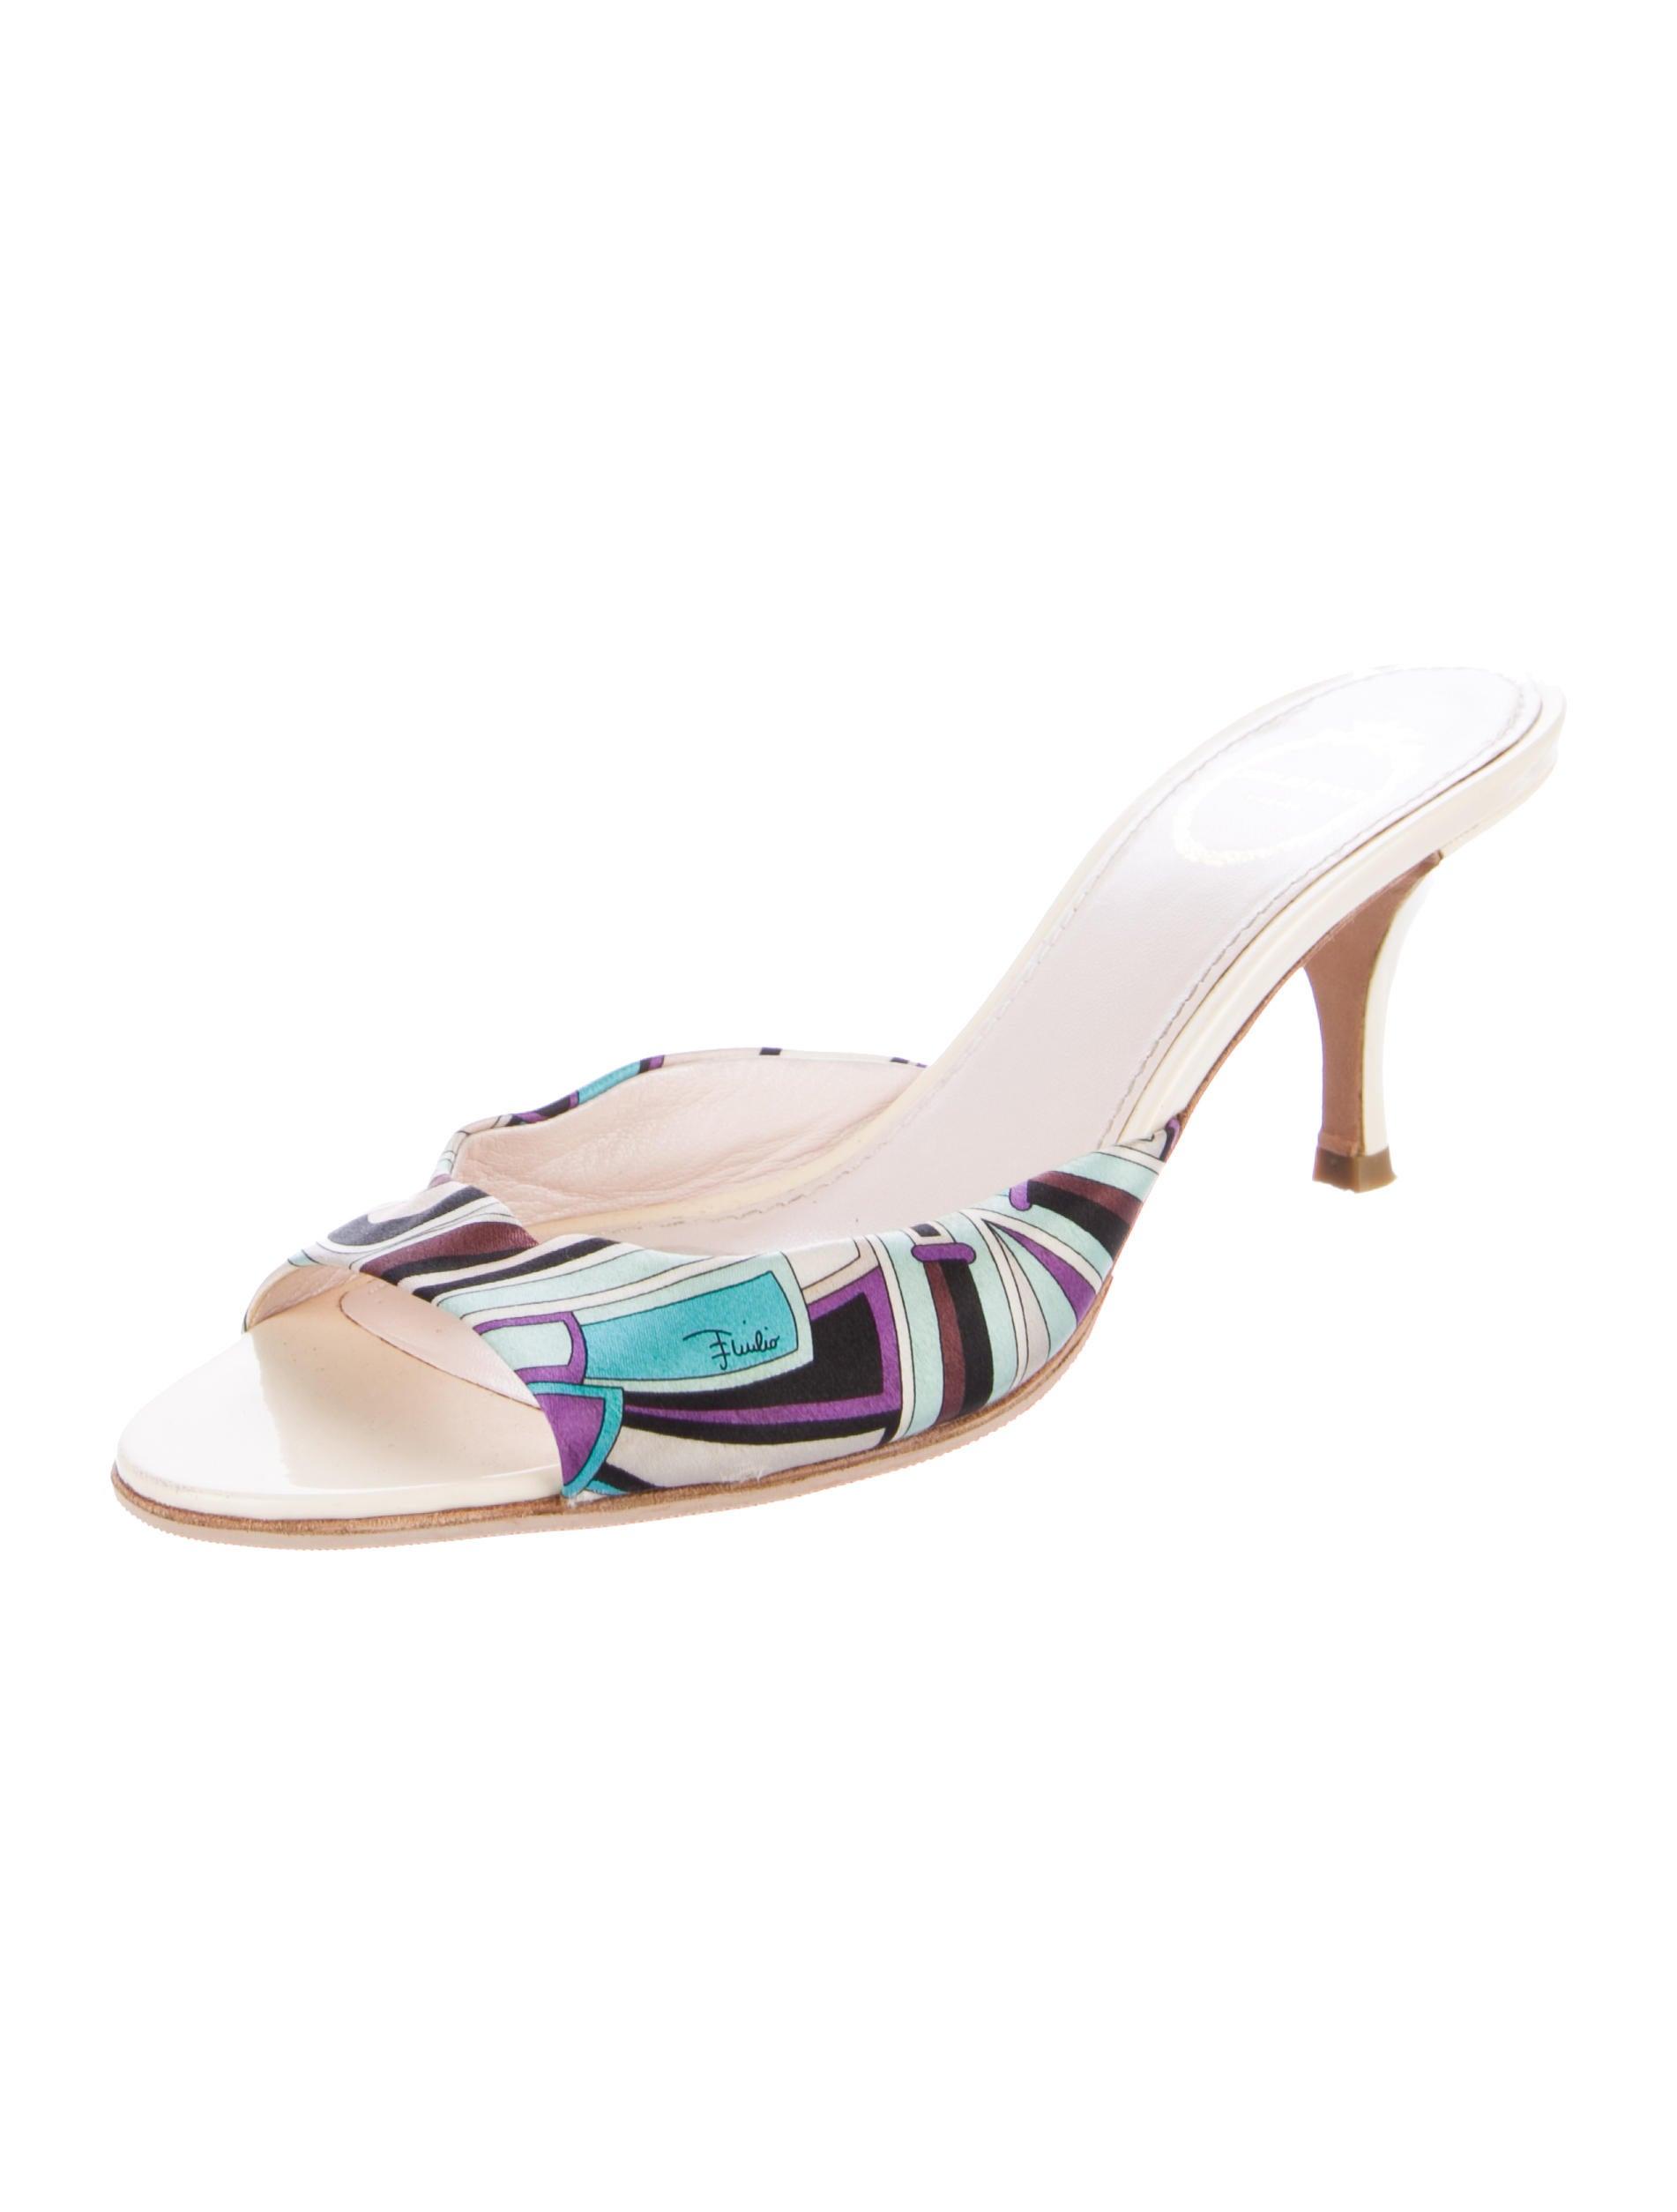 the cheapest for sale Emilio Pucci Satin Abstract Print Sandals 2014 unisex cheap online osaTJghPk